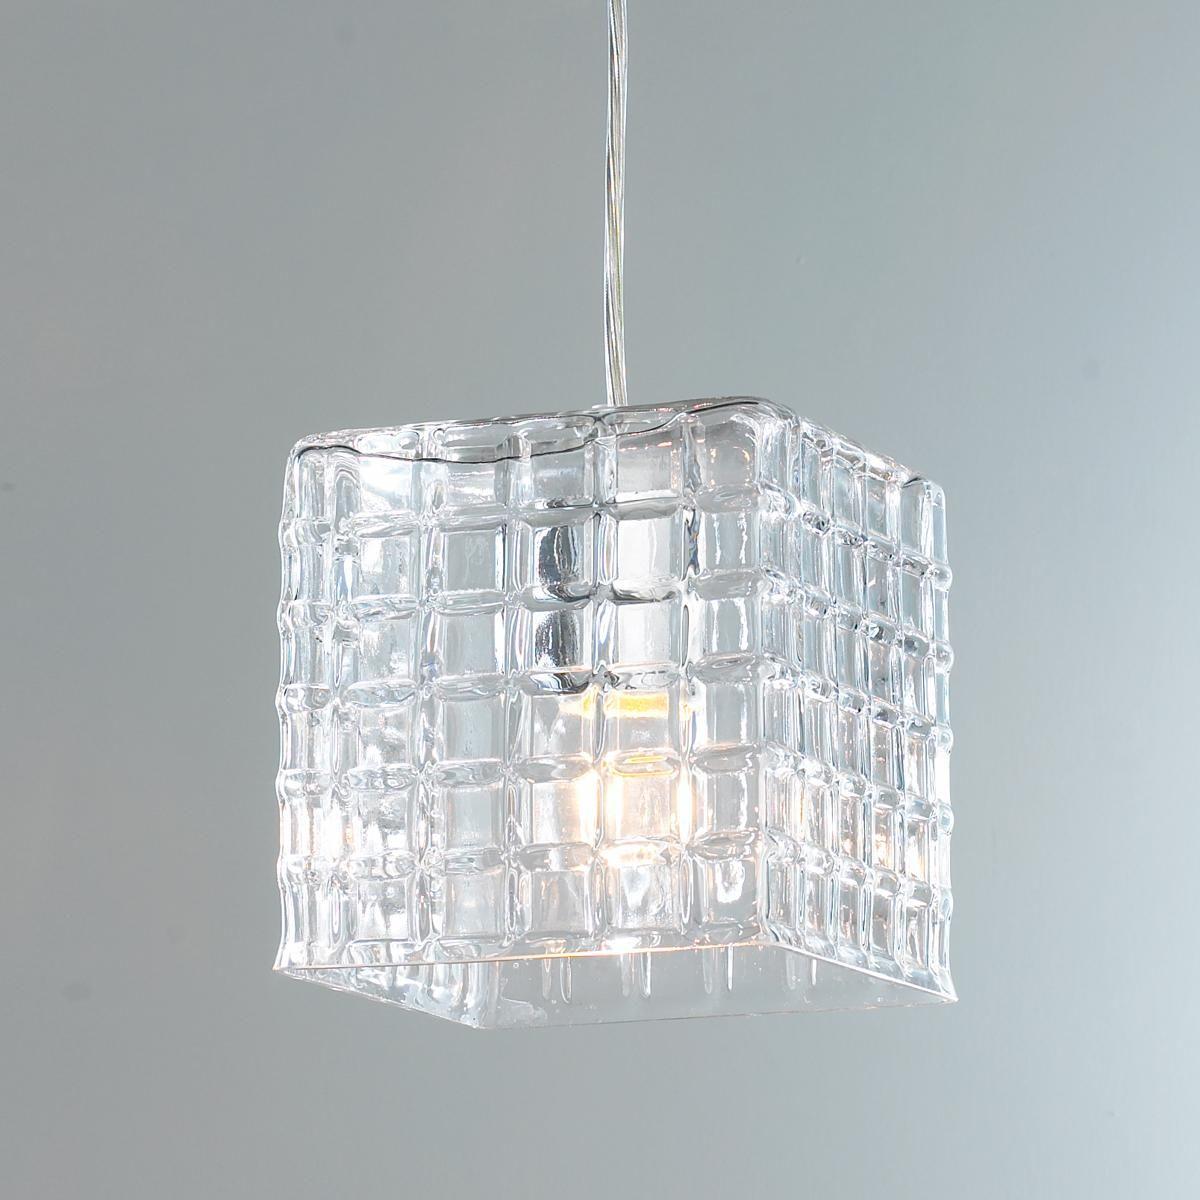 grid square glass pendant light